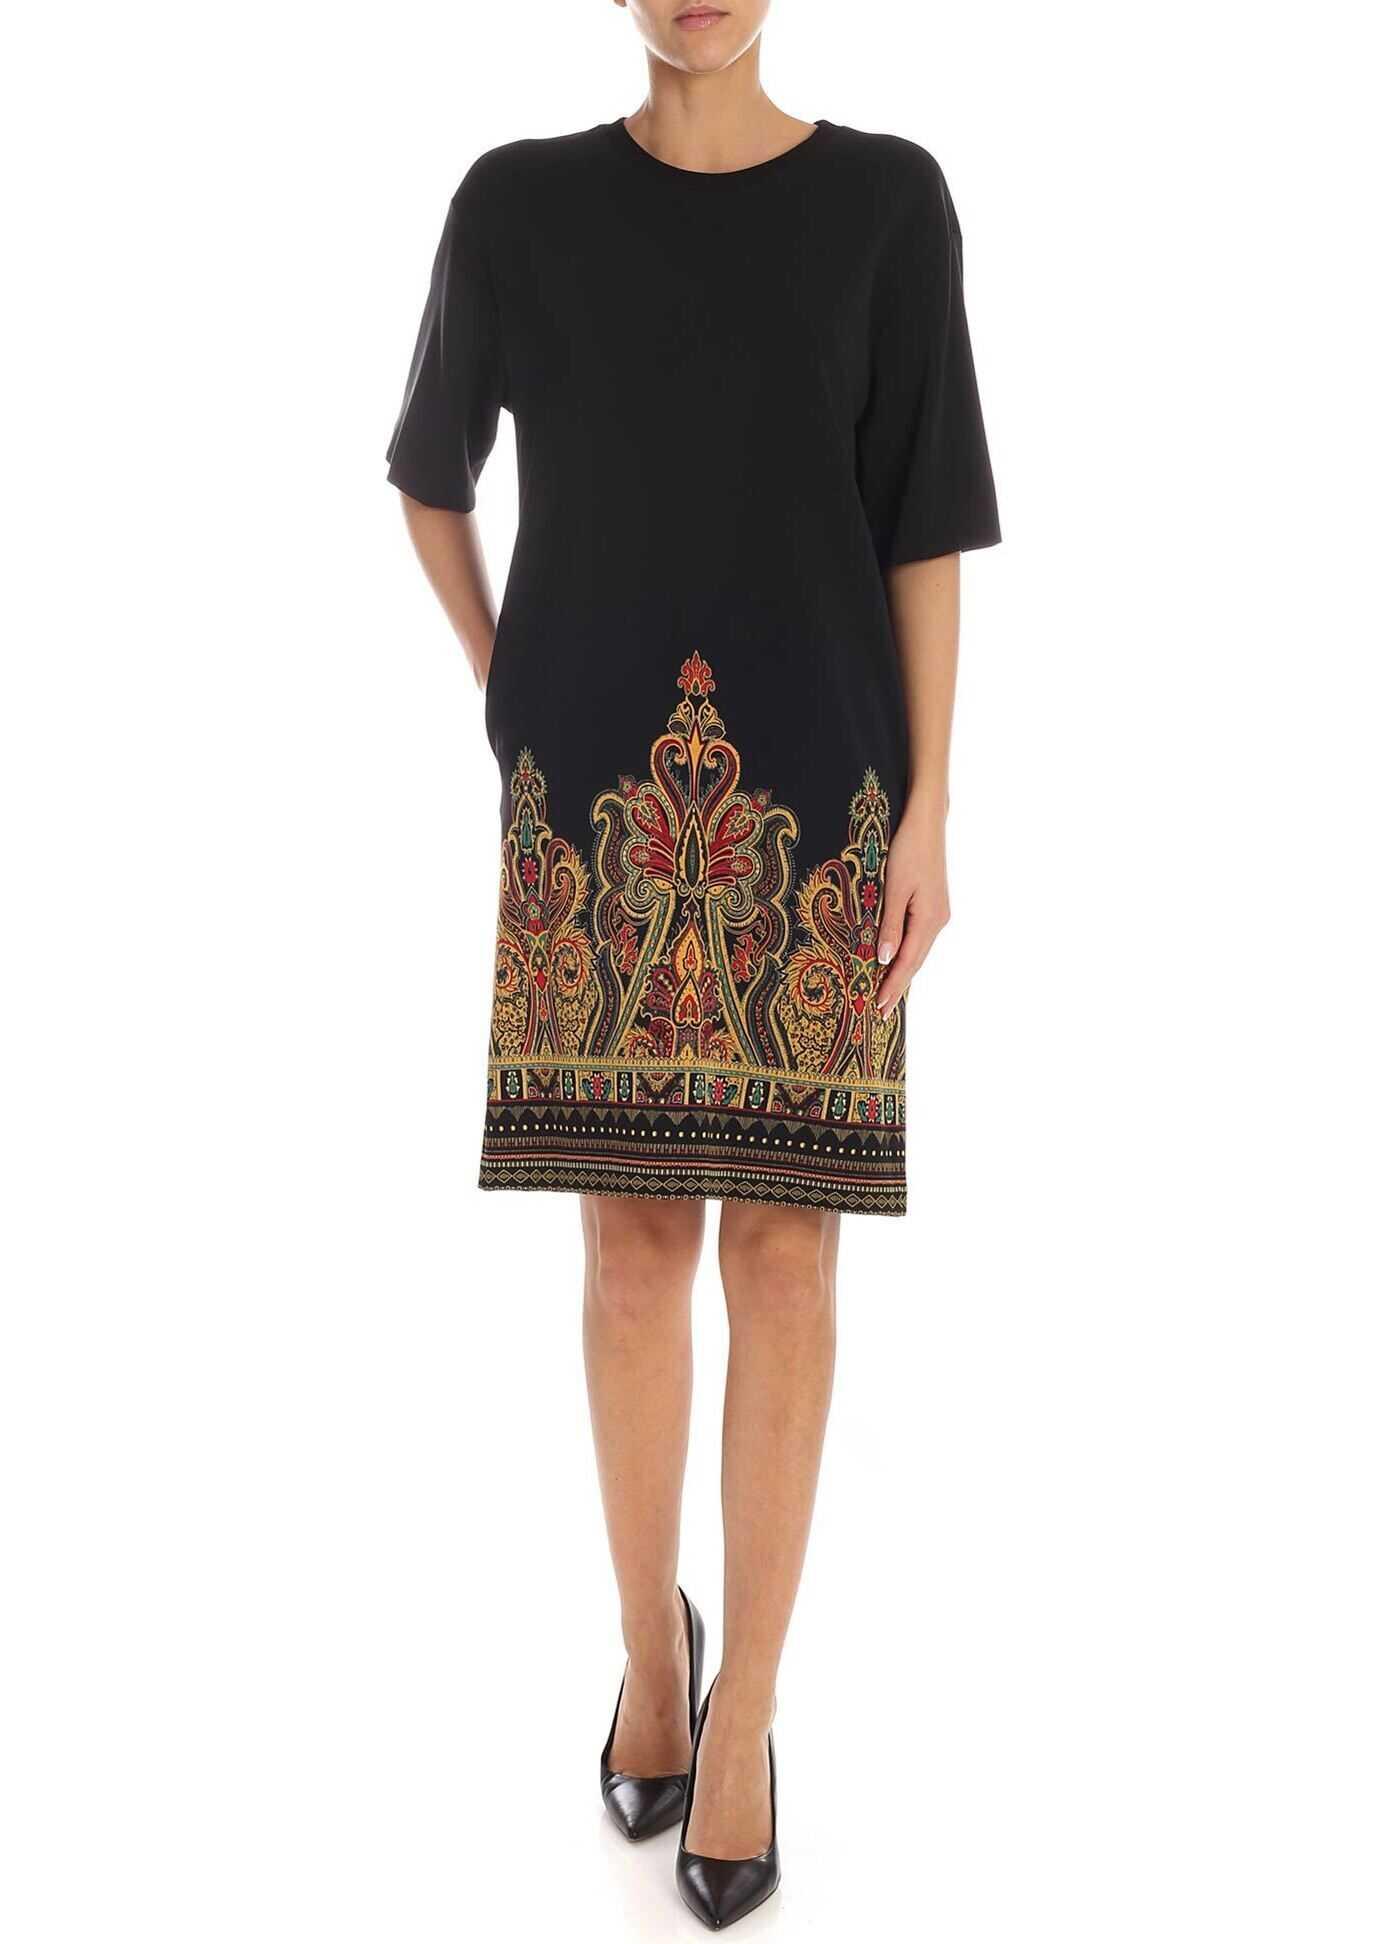 ETRO Paisley Print Dress In Black thumbnail